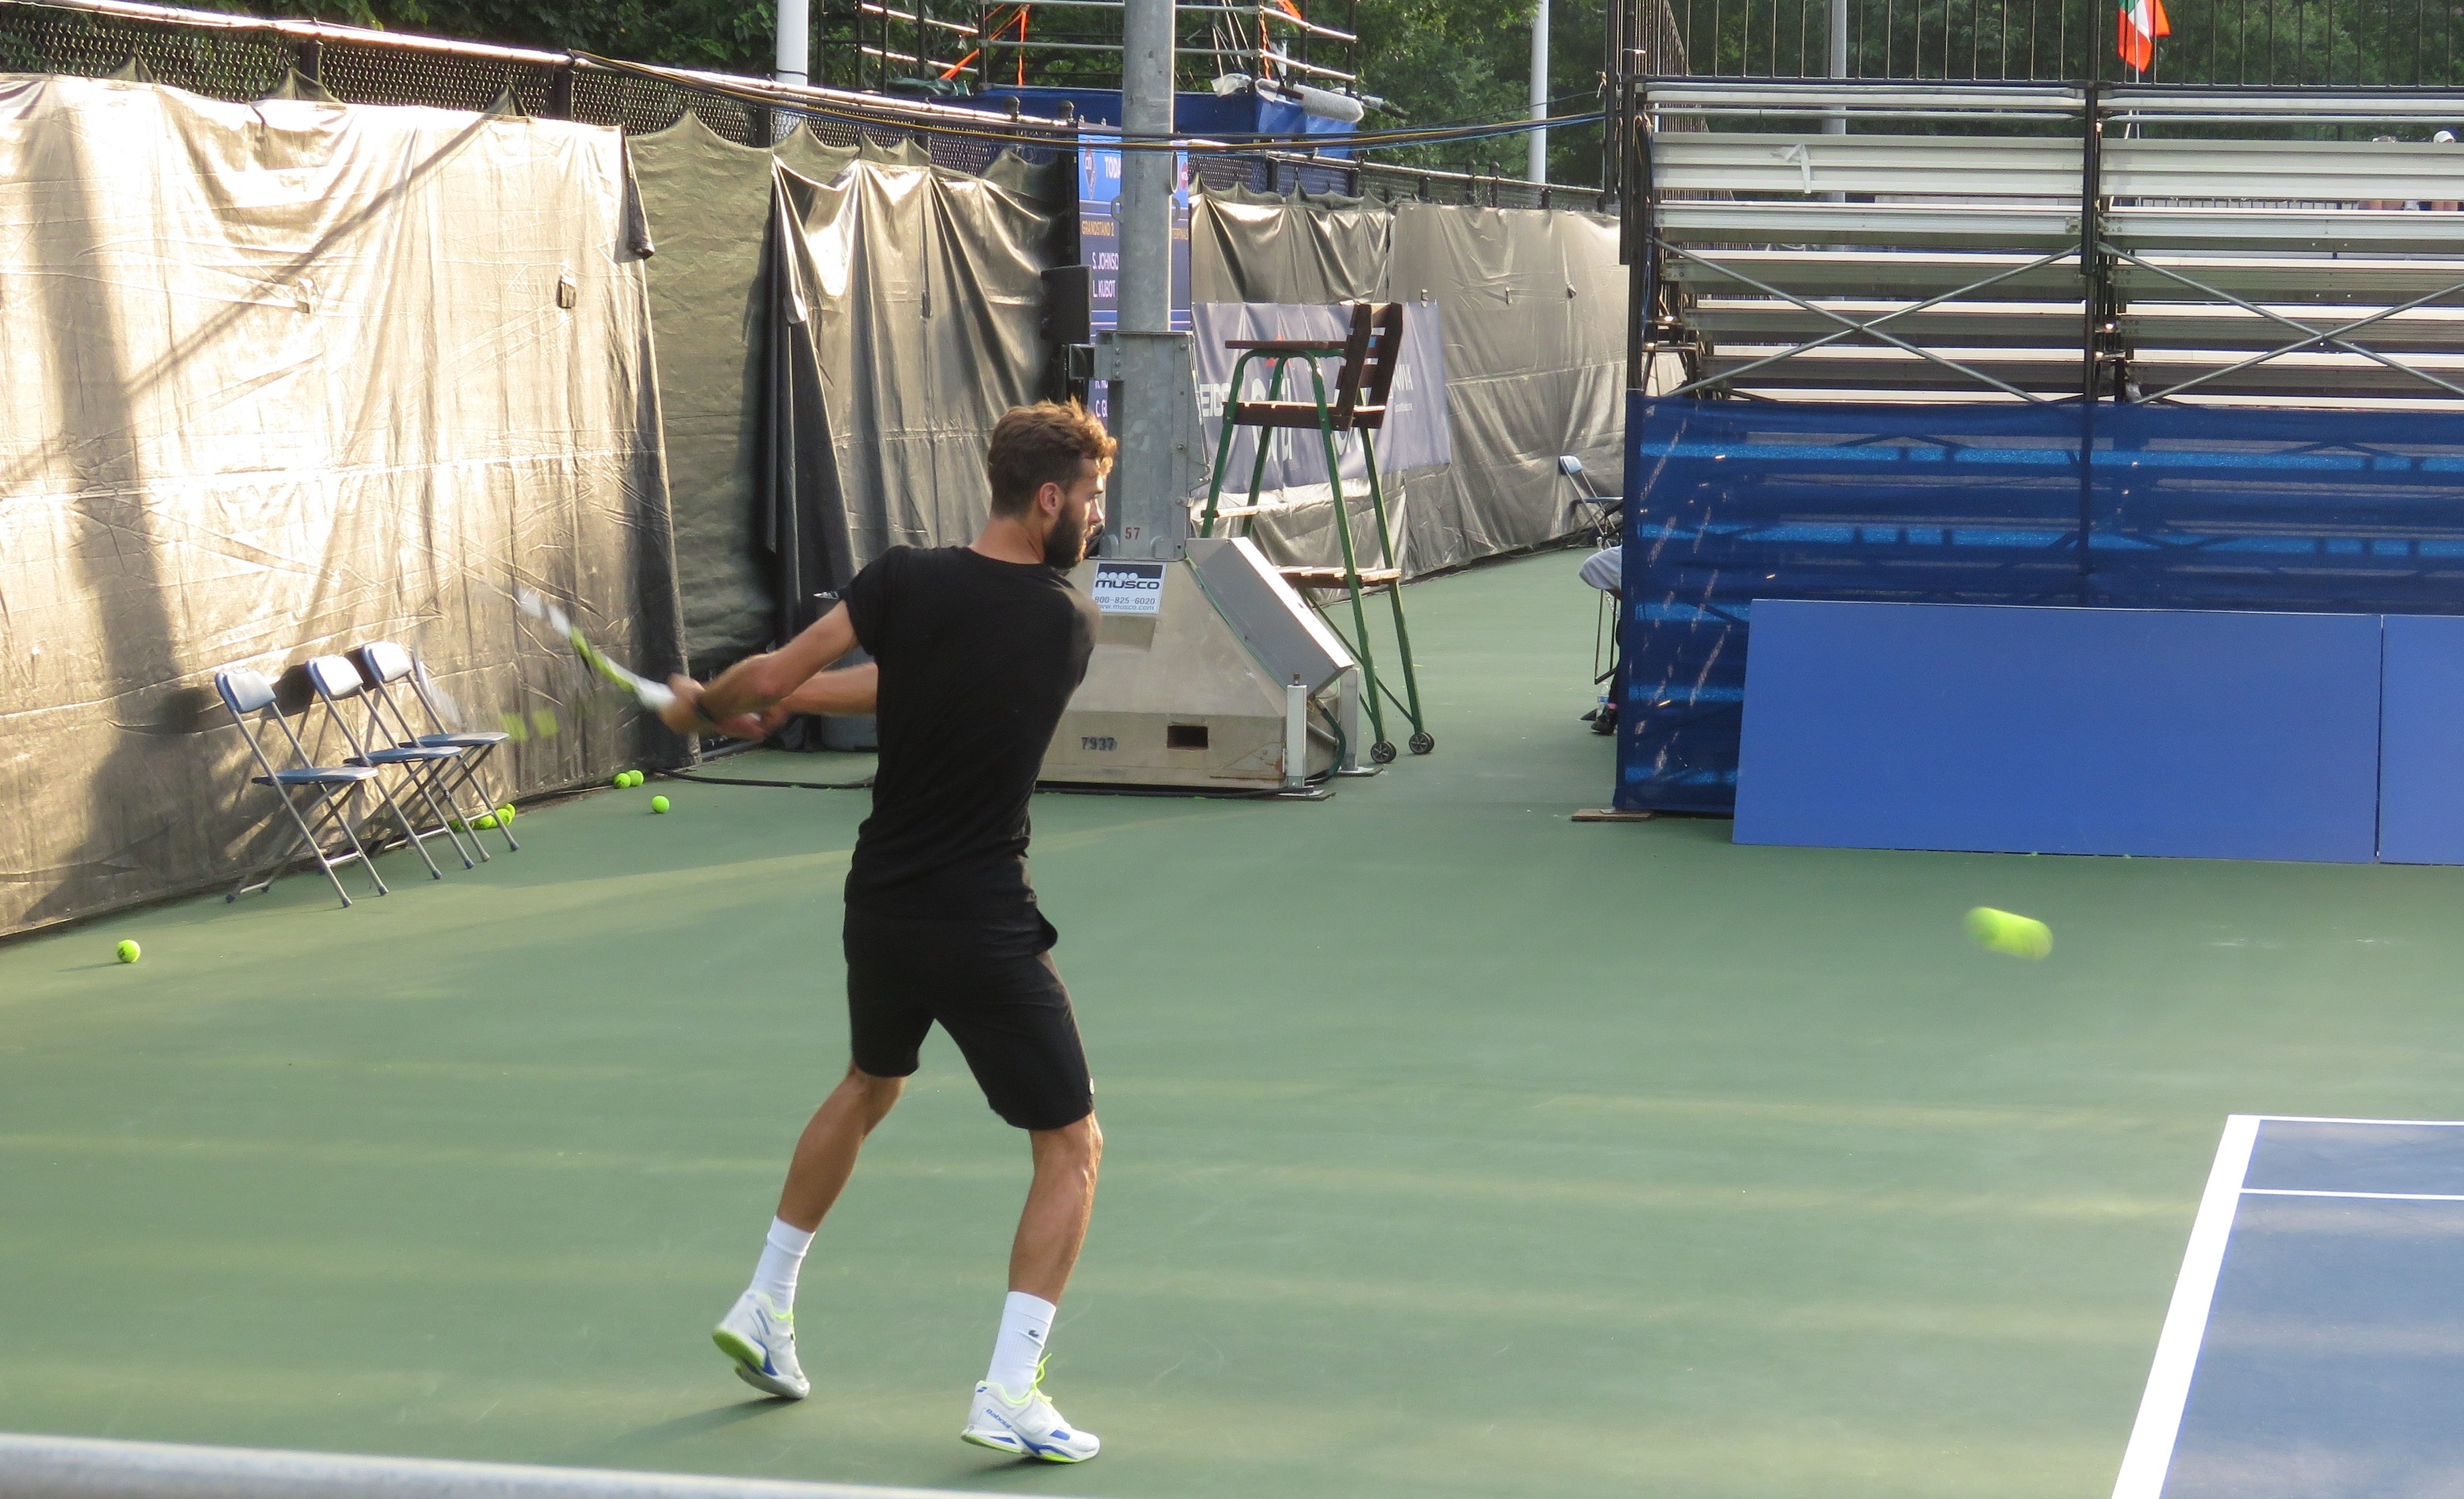 Benoit Paire 2016 Citi Open Practice